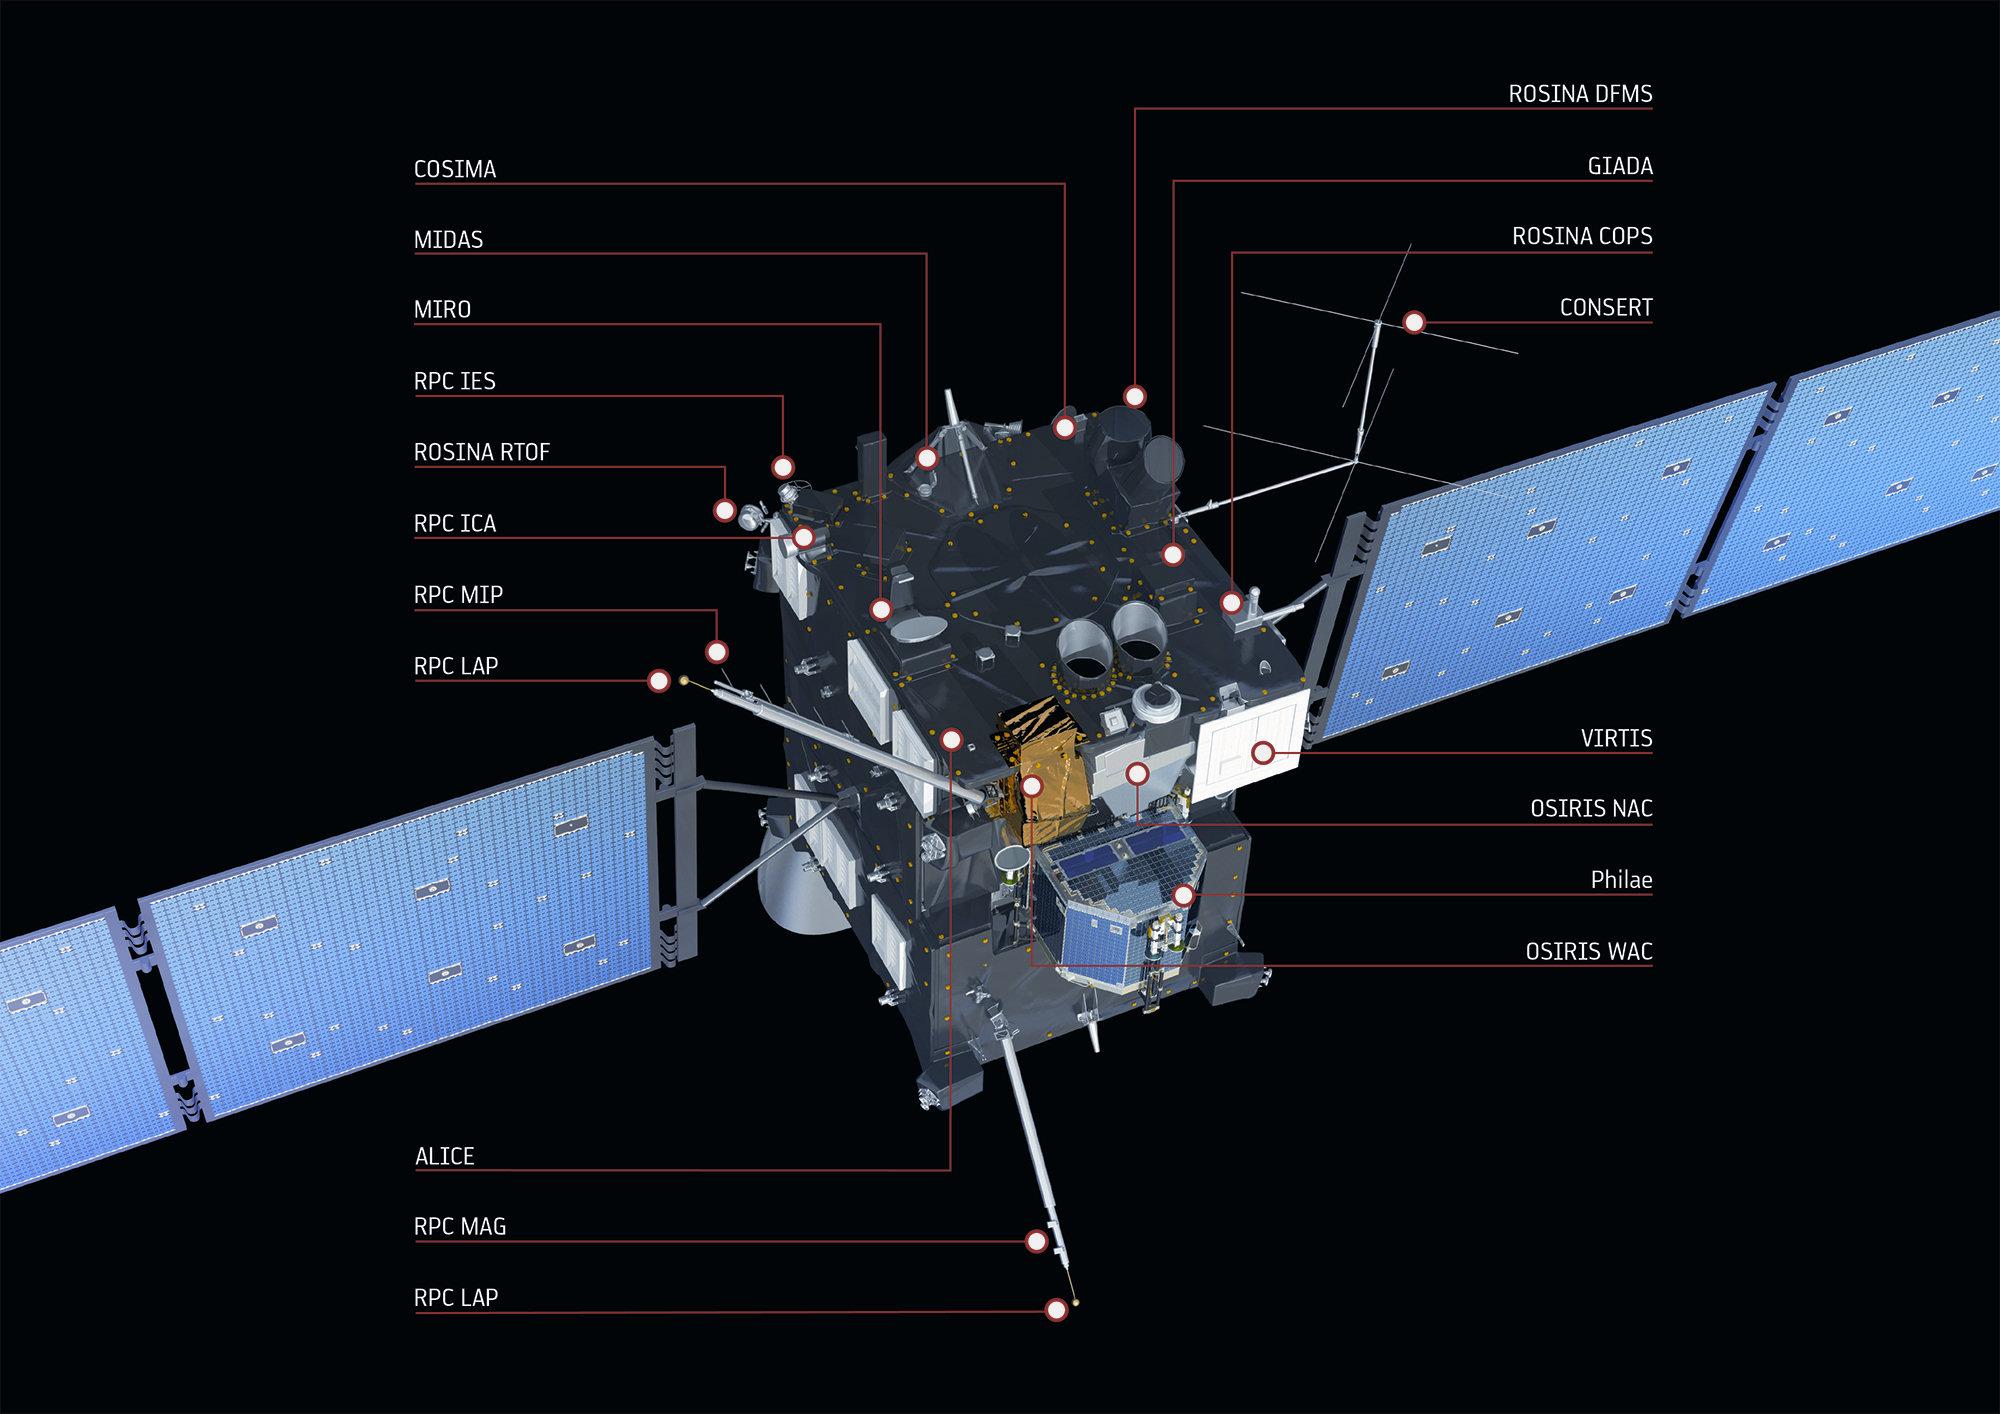 1567216479377-Rosetta_instruments_black_background_2K.jpg